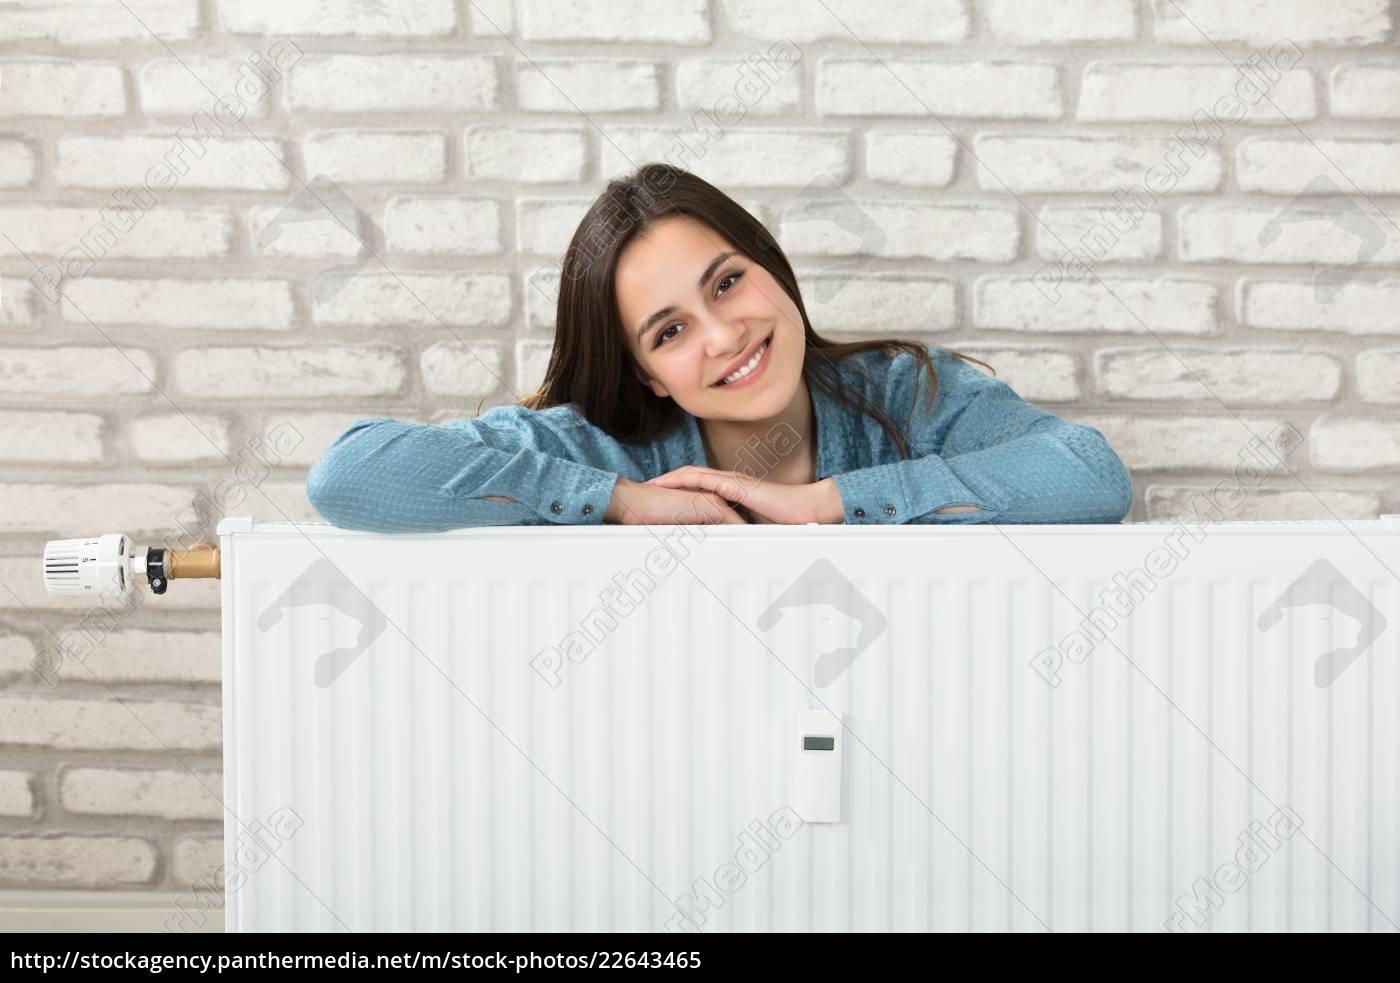 woman, behind, the, heating, radiator - 22643465